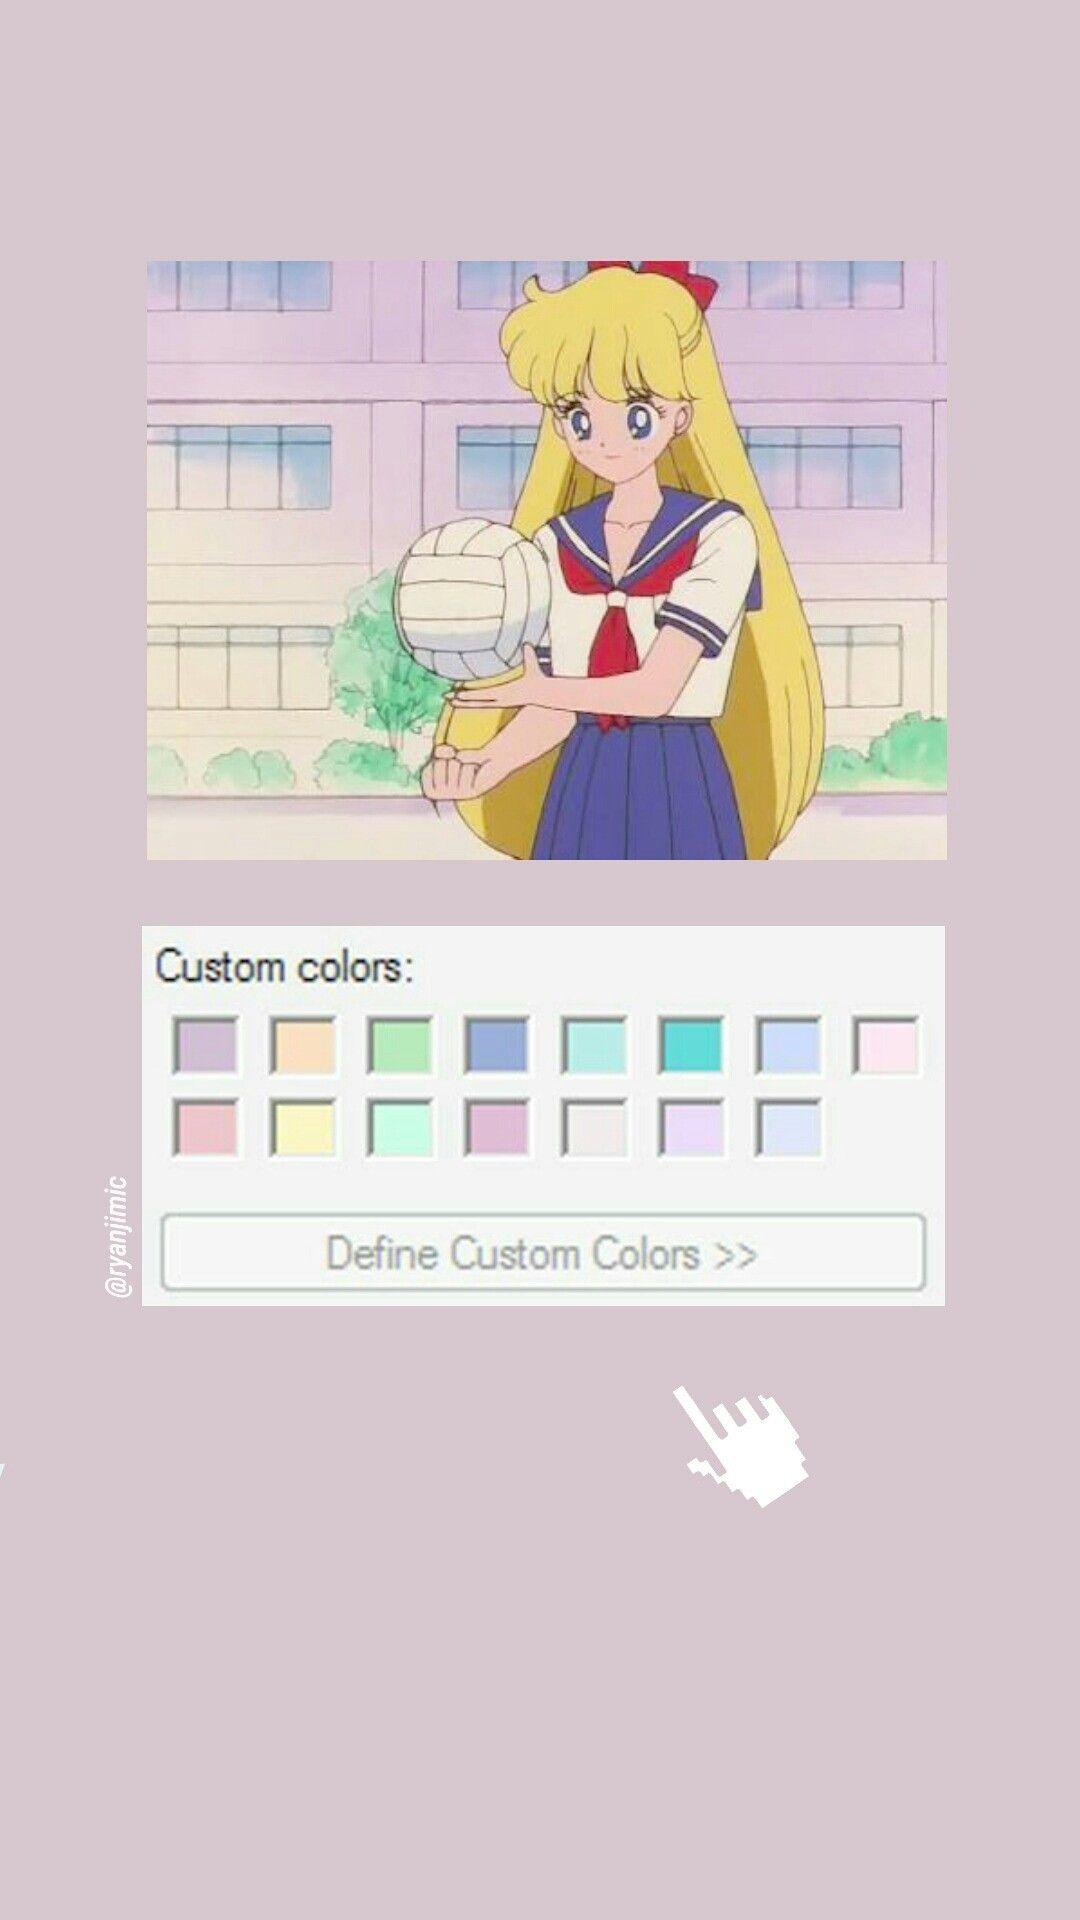 Sailor Moon Wallpaper Sailor Moon Sailor Moon Wallpaper Sailor Moon Aesthetic